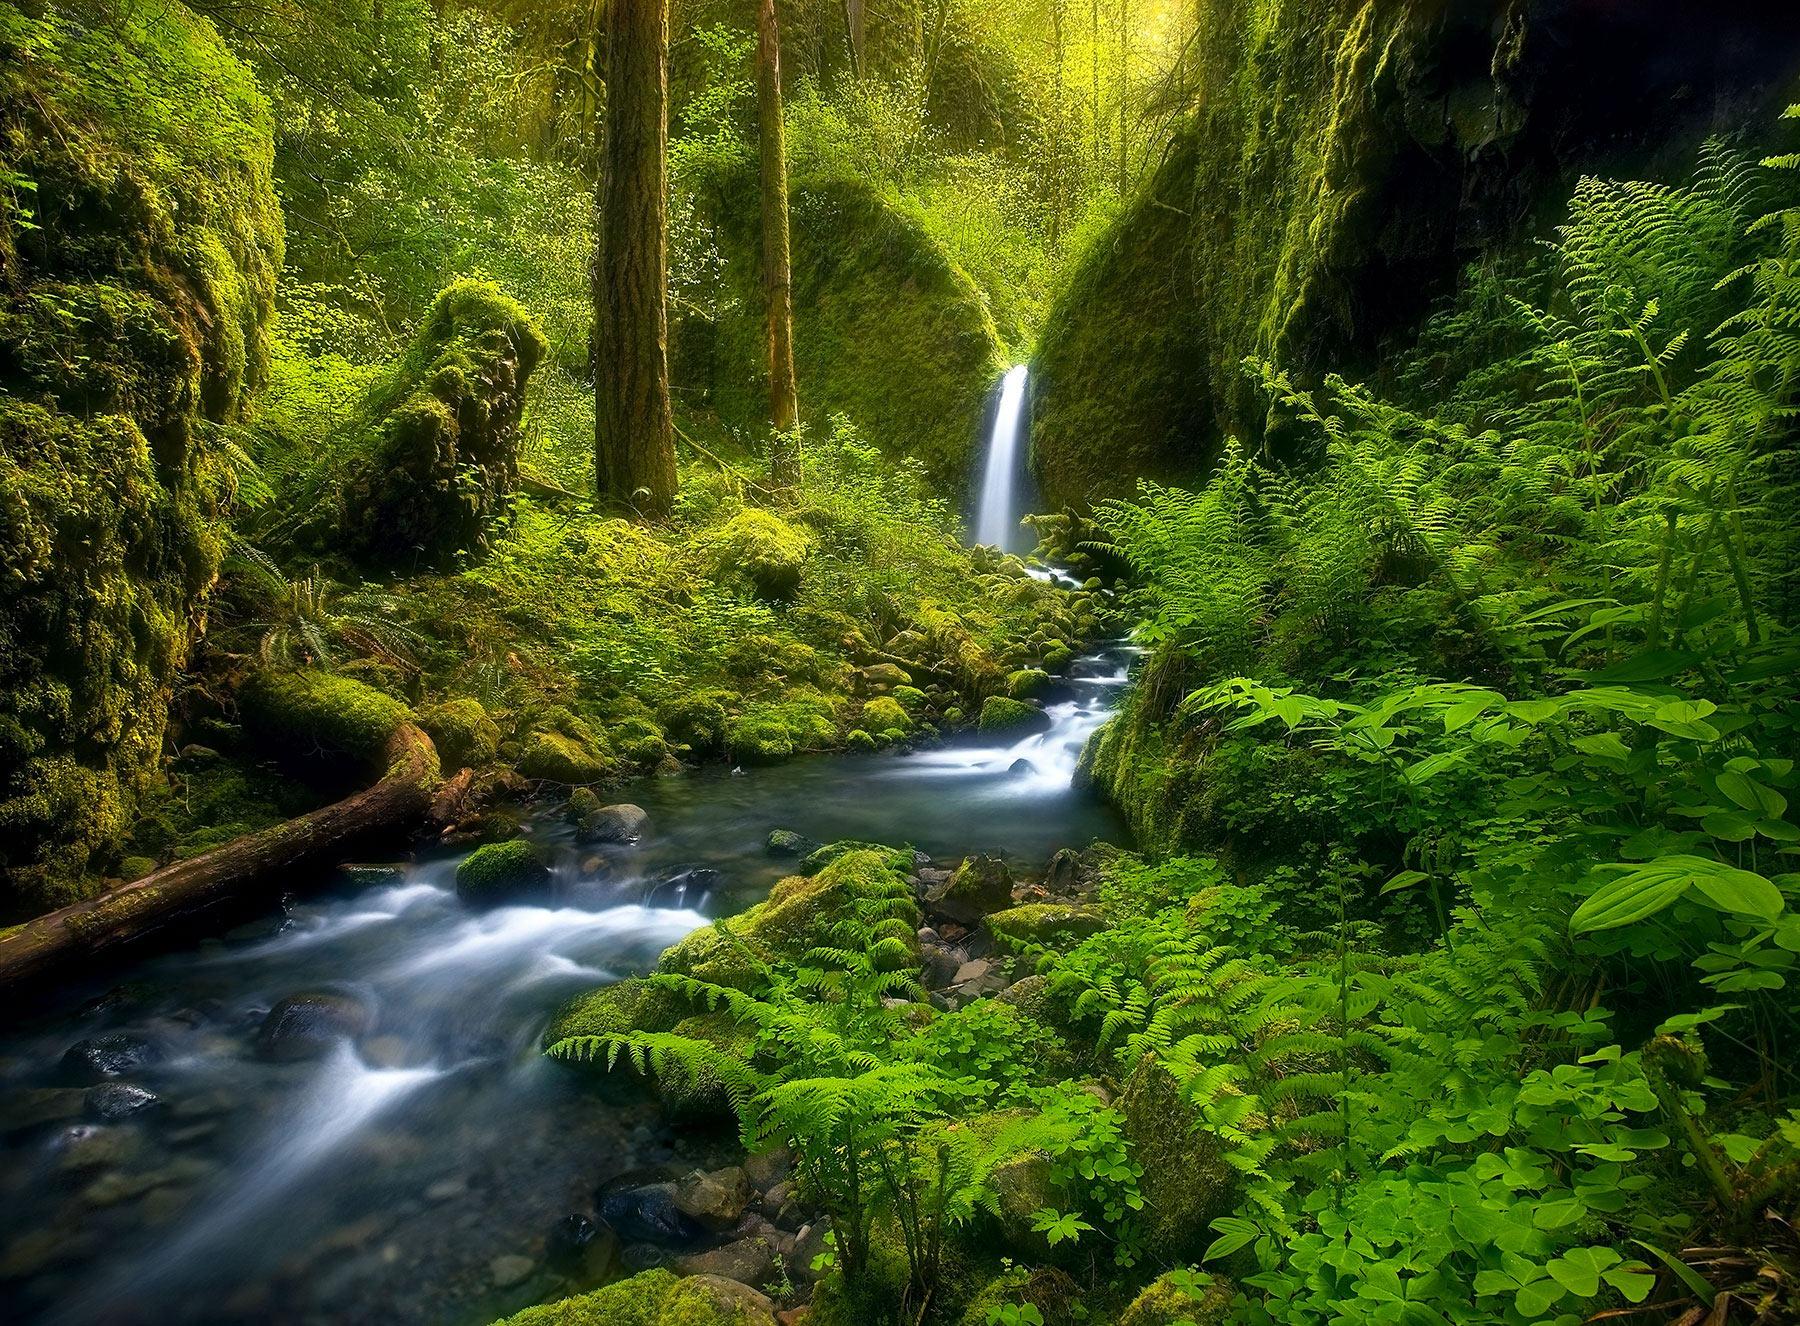 enchanting, waterfall, stream, wild, remote, oregon, columbia gorge, photo